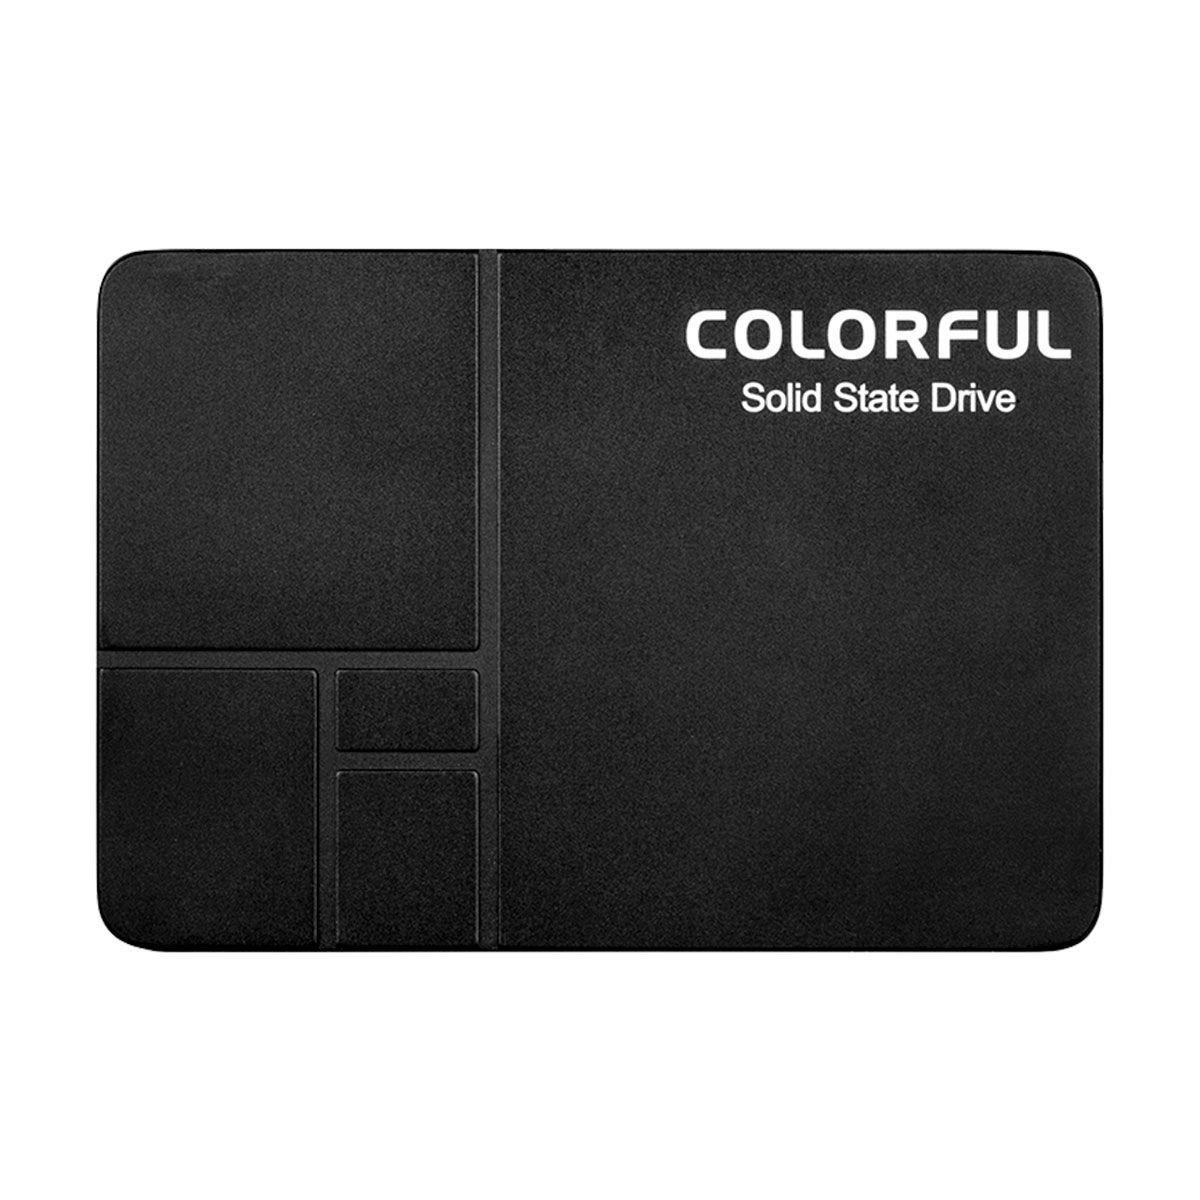 SSD 640GB Sata III SL 500 28799 - Colorful